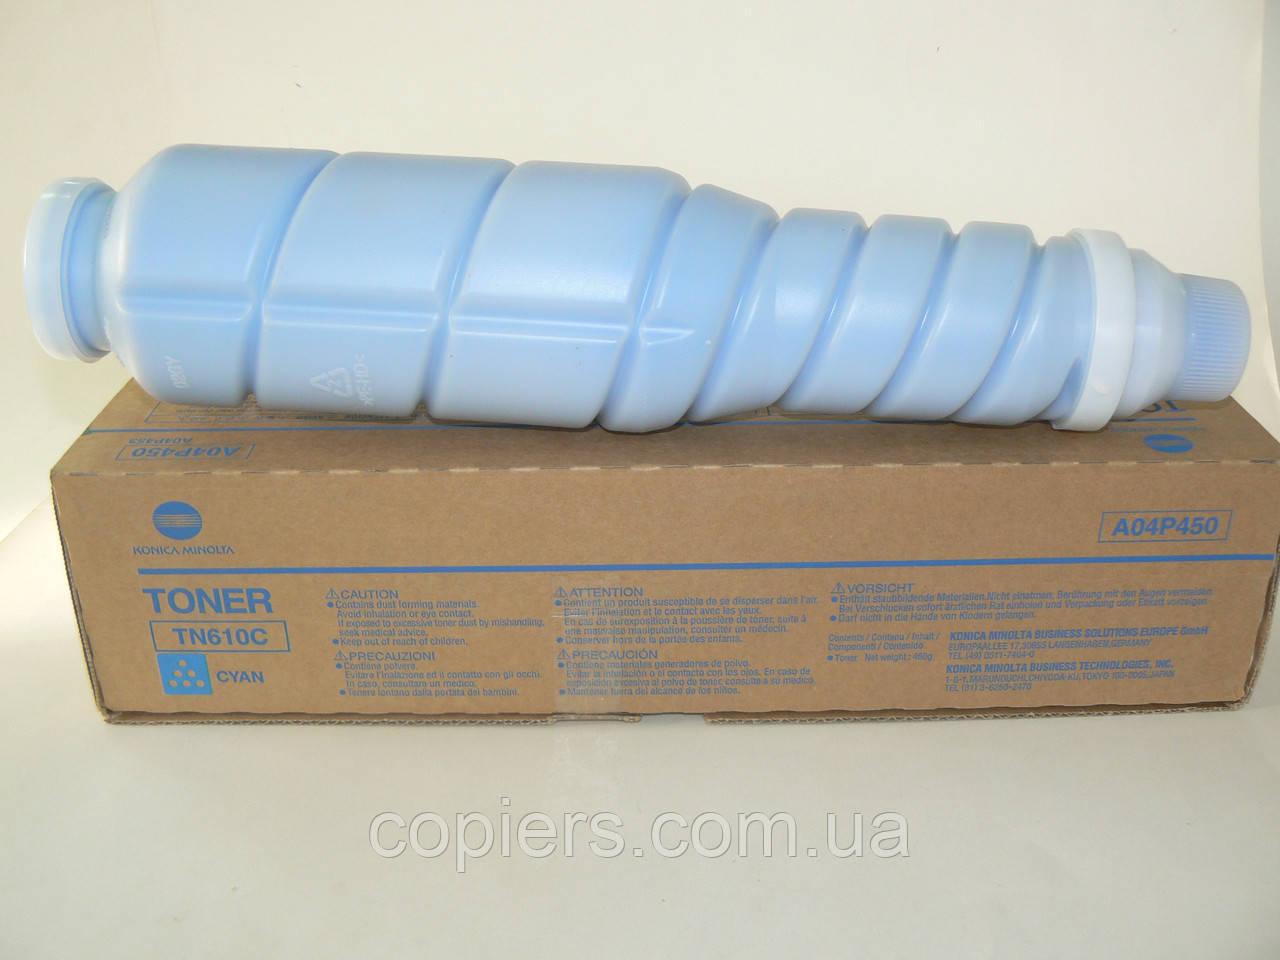 Тонер TN-610 Cyan оригинал, Bizhub Pro C6500/C5500, A04P450 Konica Minolta